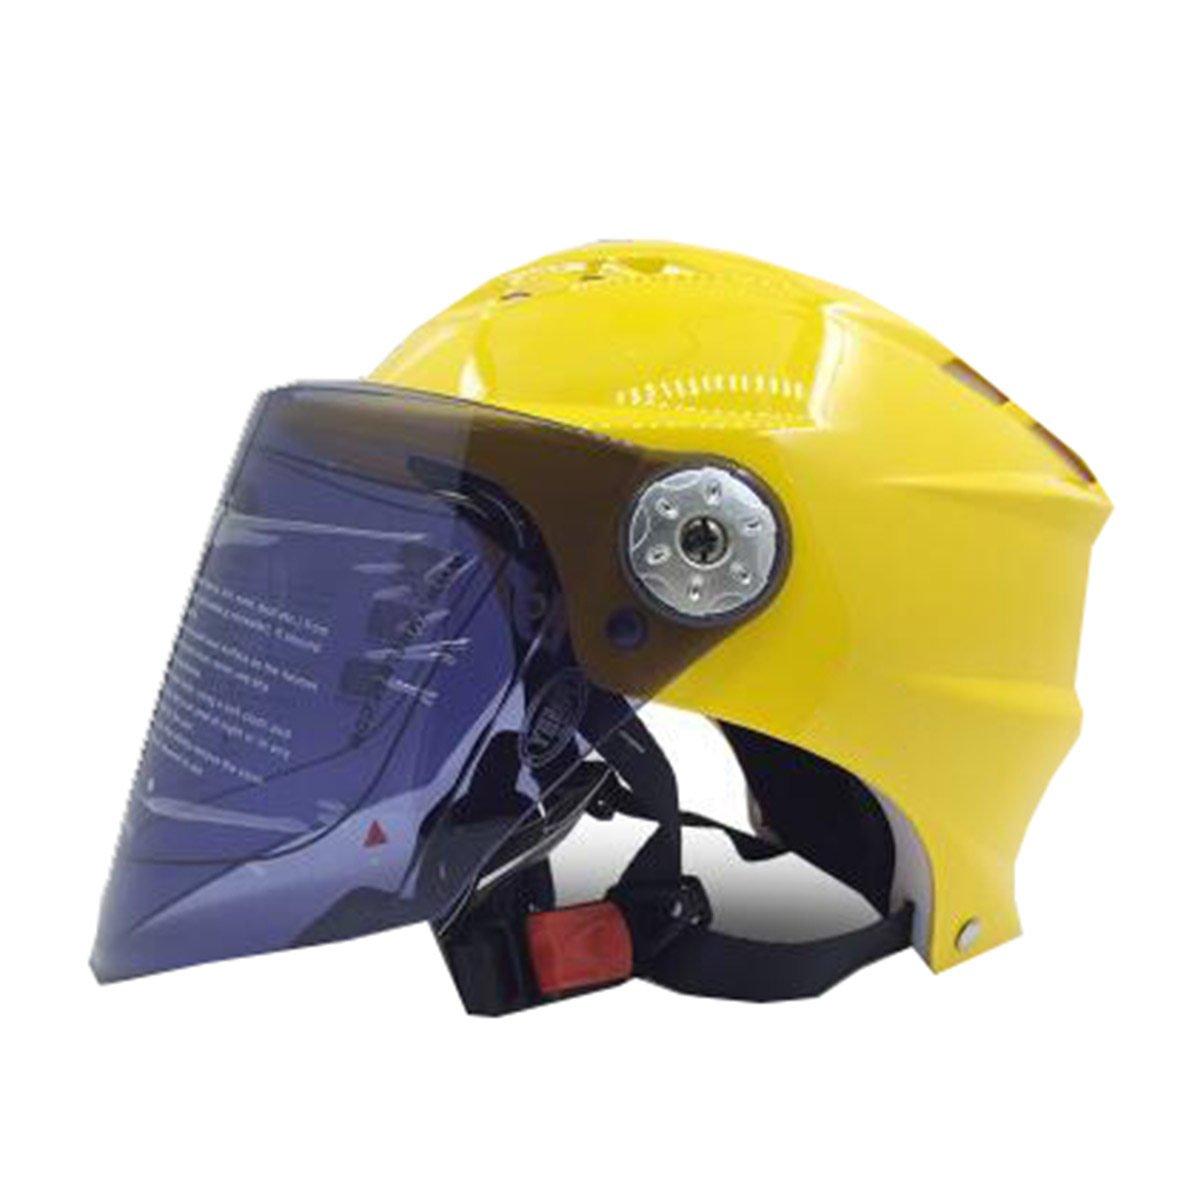 TZQ Einfache Großzügige Männer Damen Reiter Ritter Sommer Sonnenschutz Motorrad Kopf Frühling Herbst Helm Helm